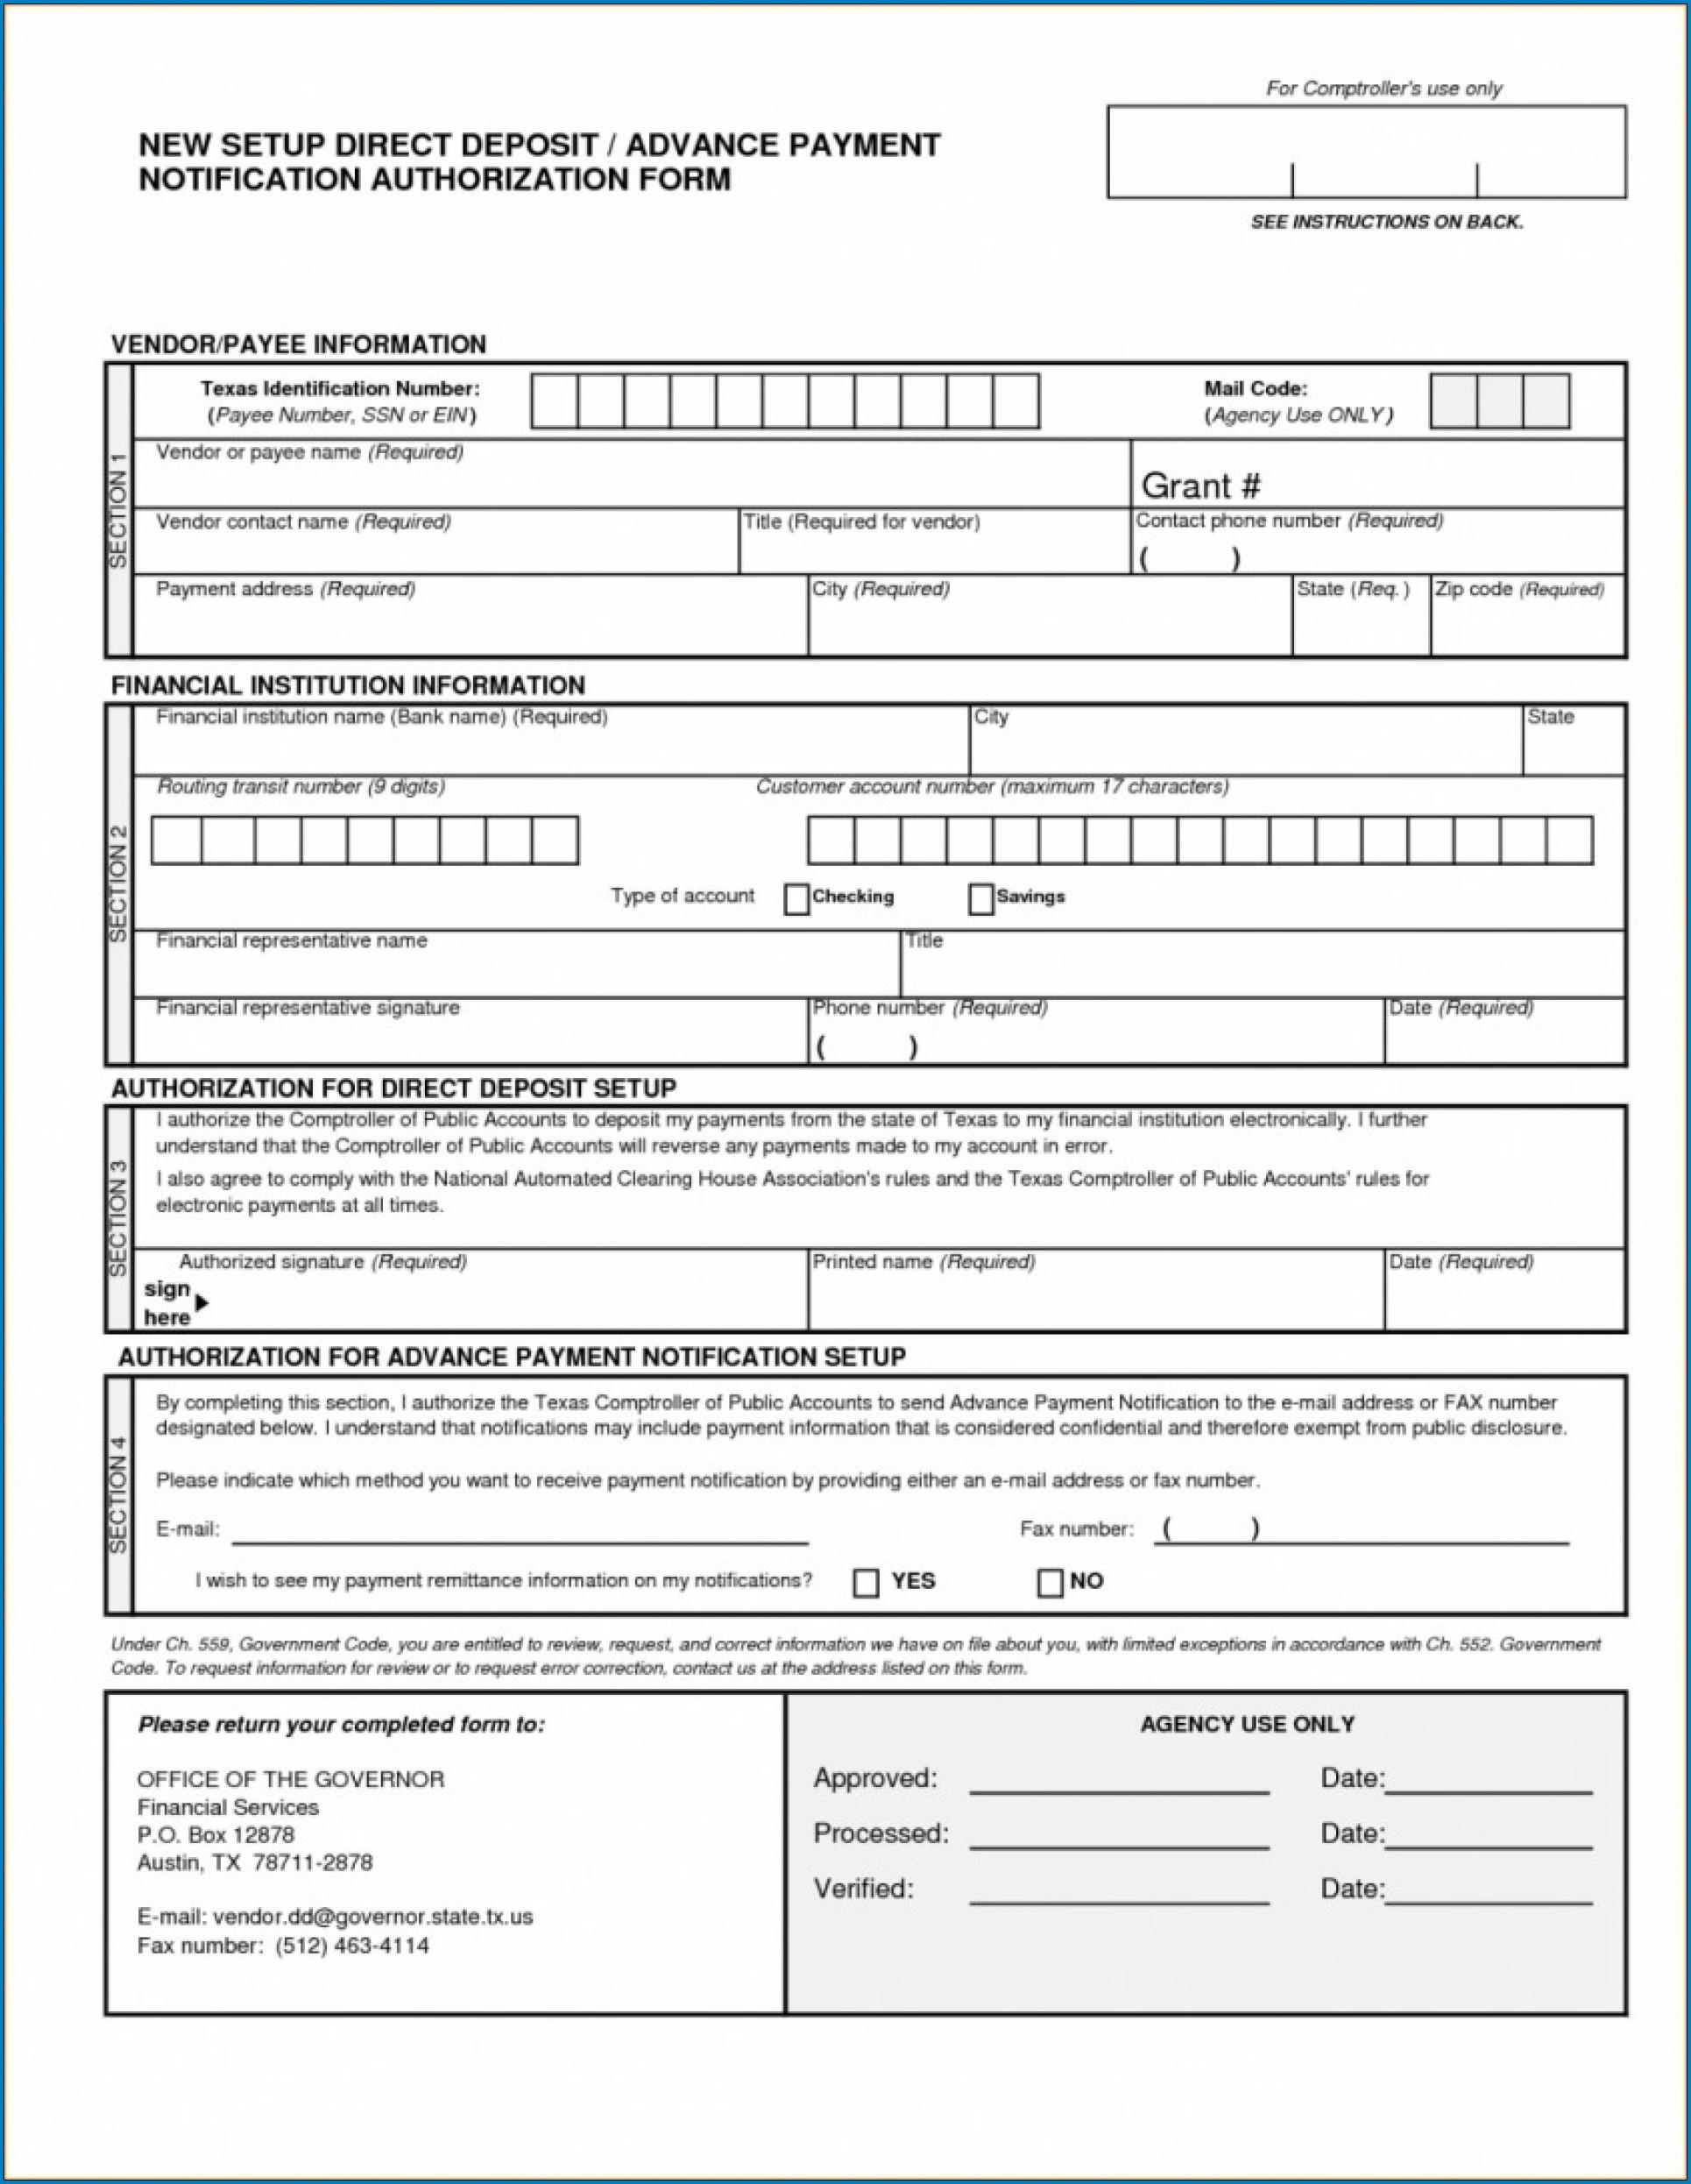 Wells Fargo Direct Deposit Form For Work Sample